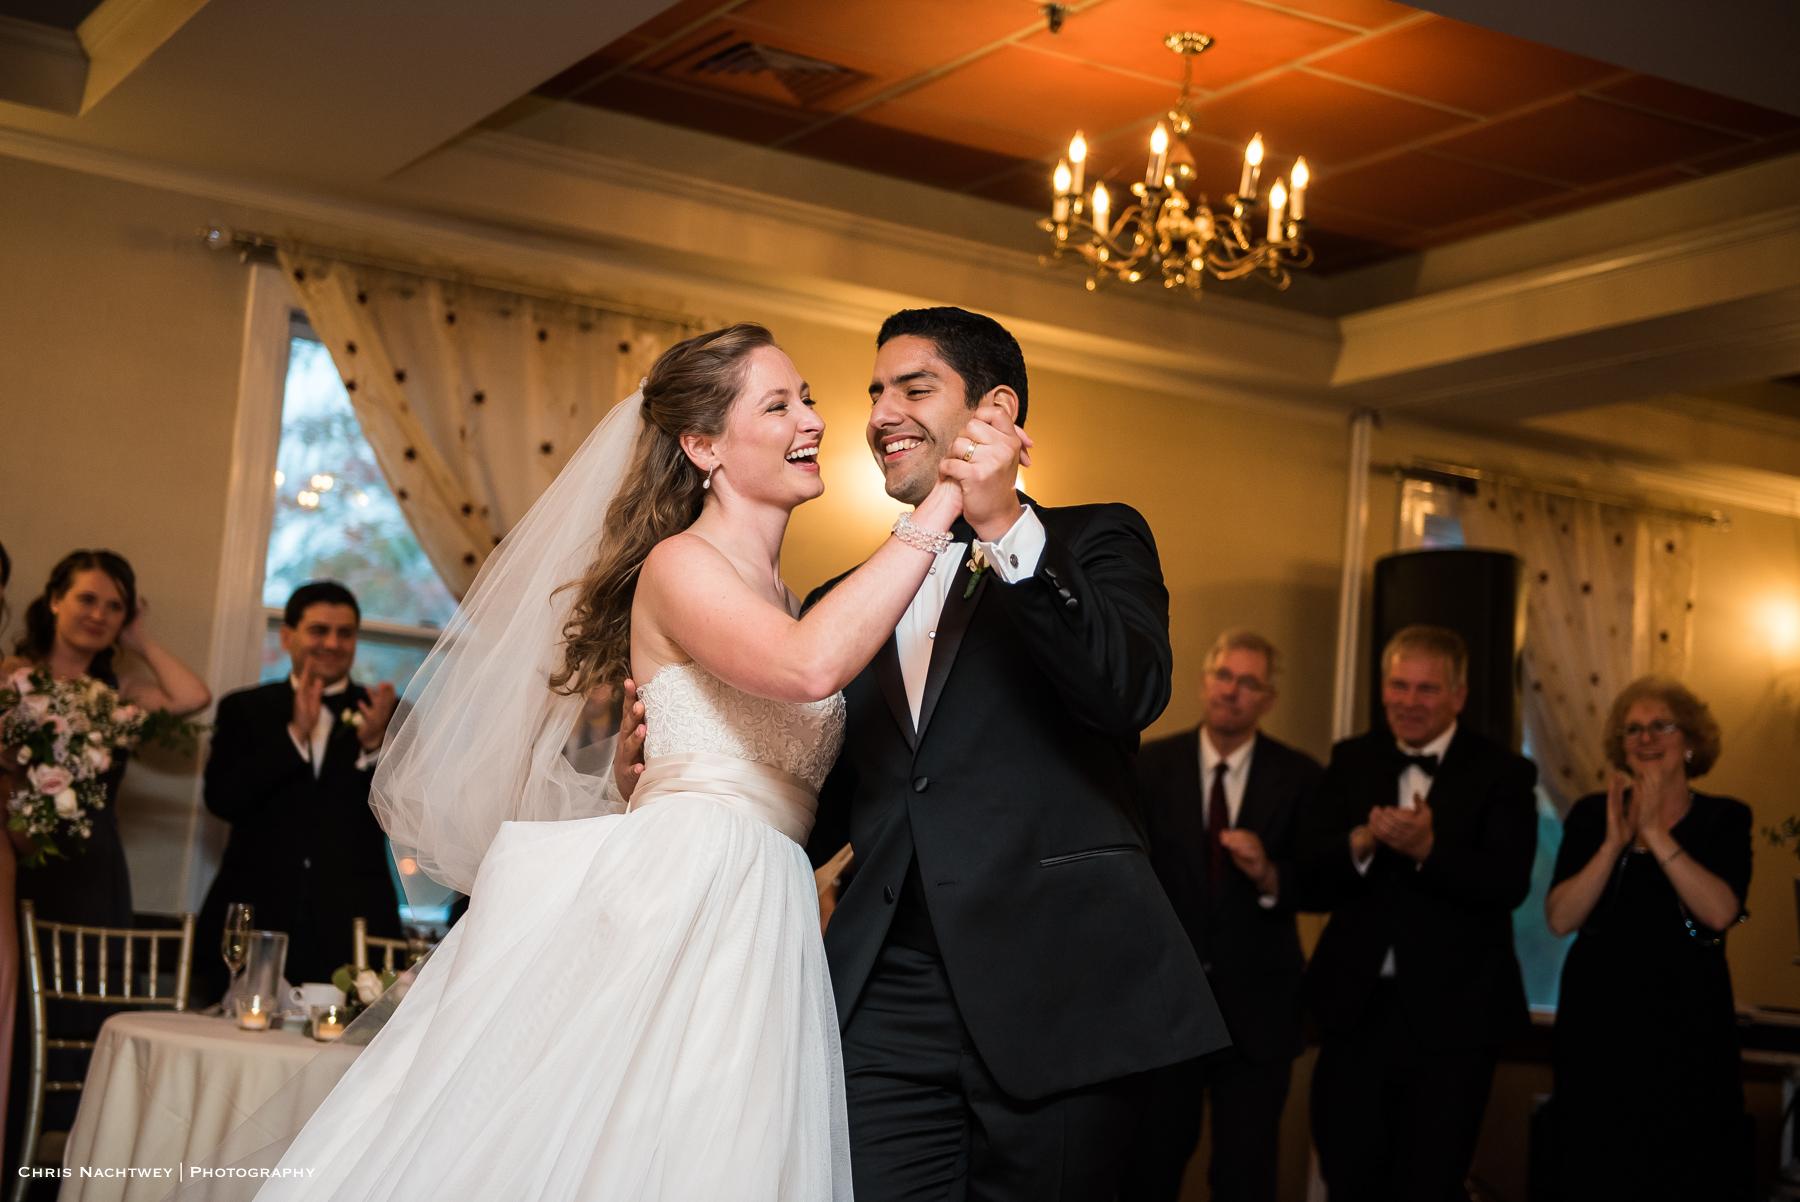 wedding-the-litchfield-inn-ct-photos-chris-nachtwey-photography-2018-48.jpg